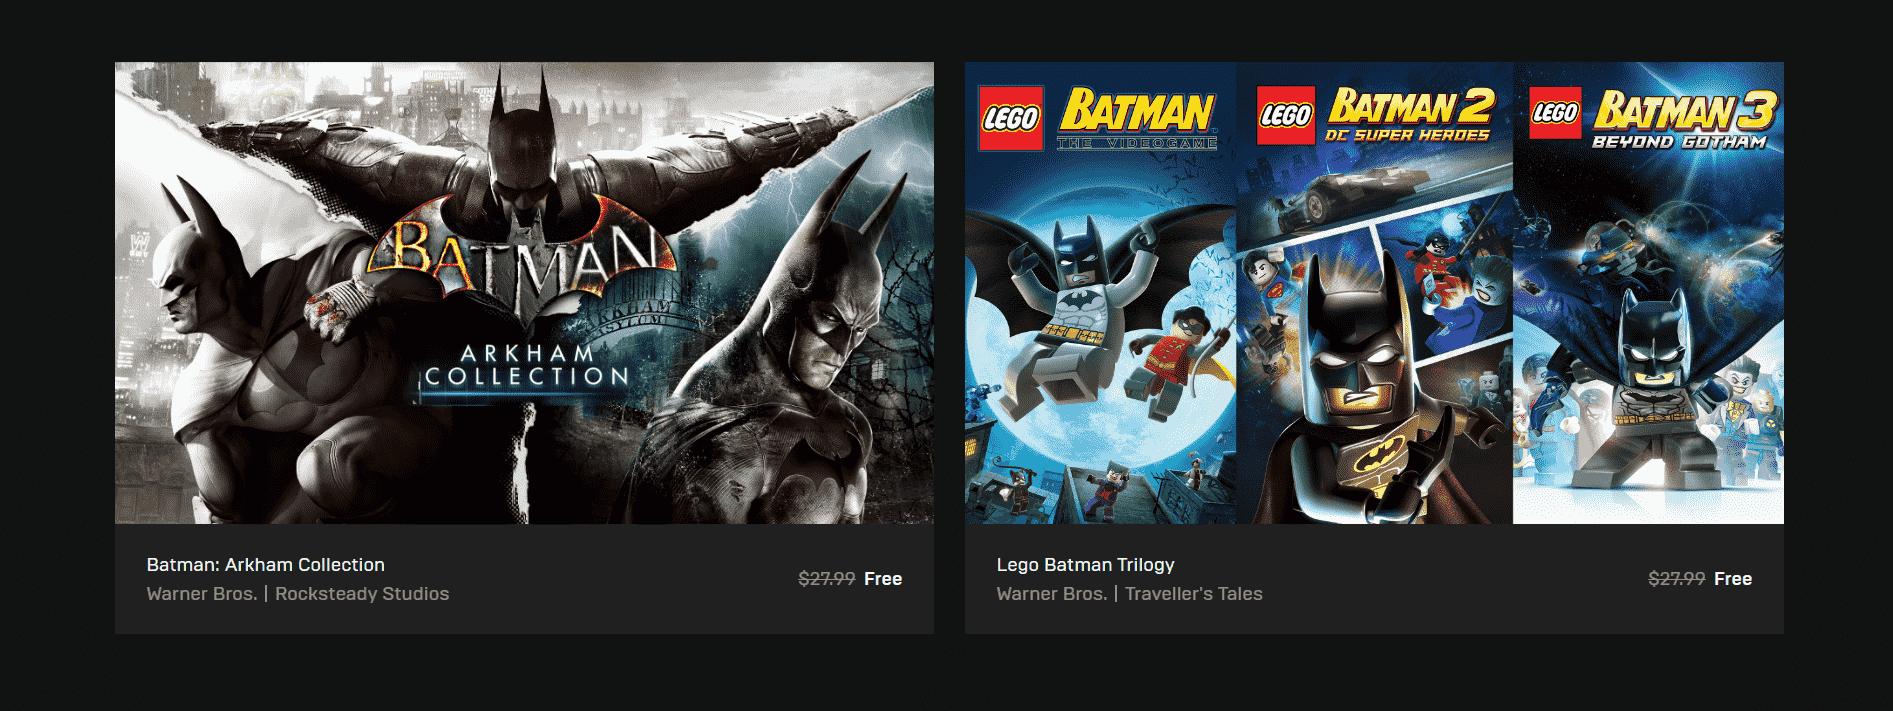 Epic Store Batman Arkham